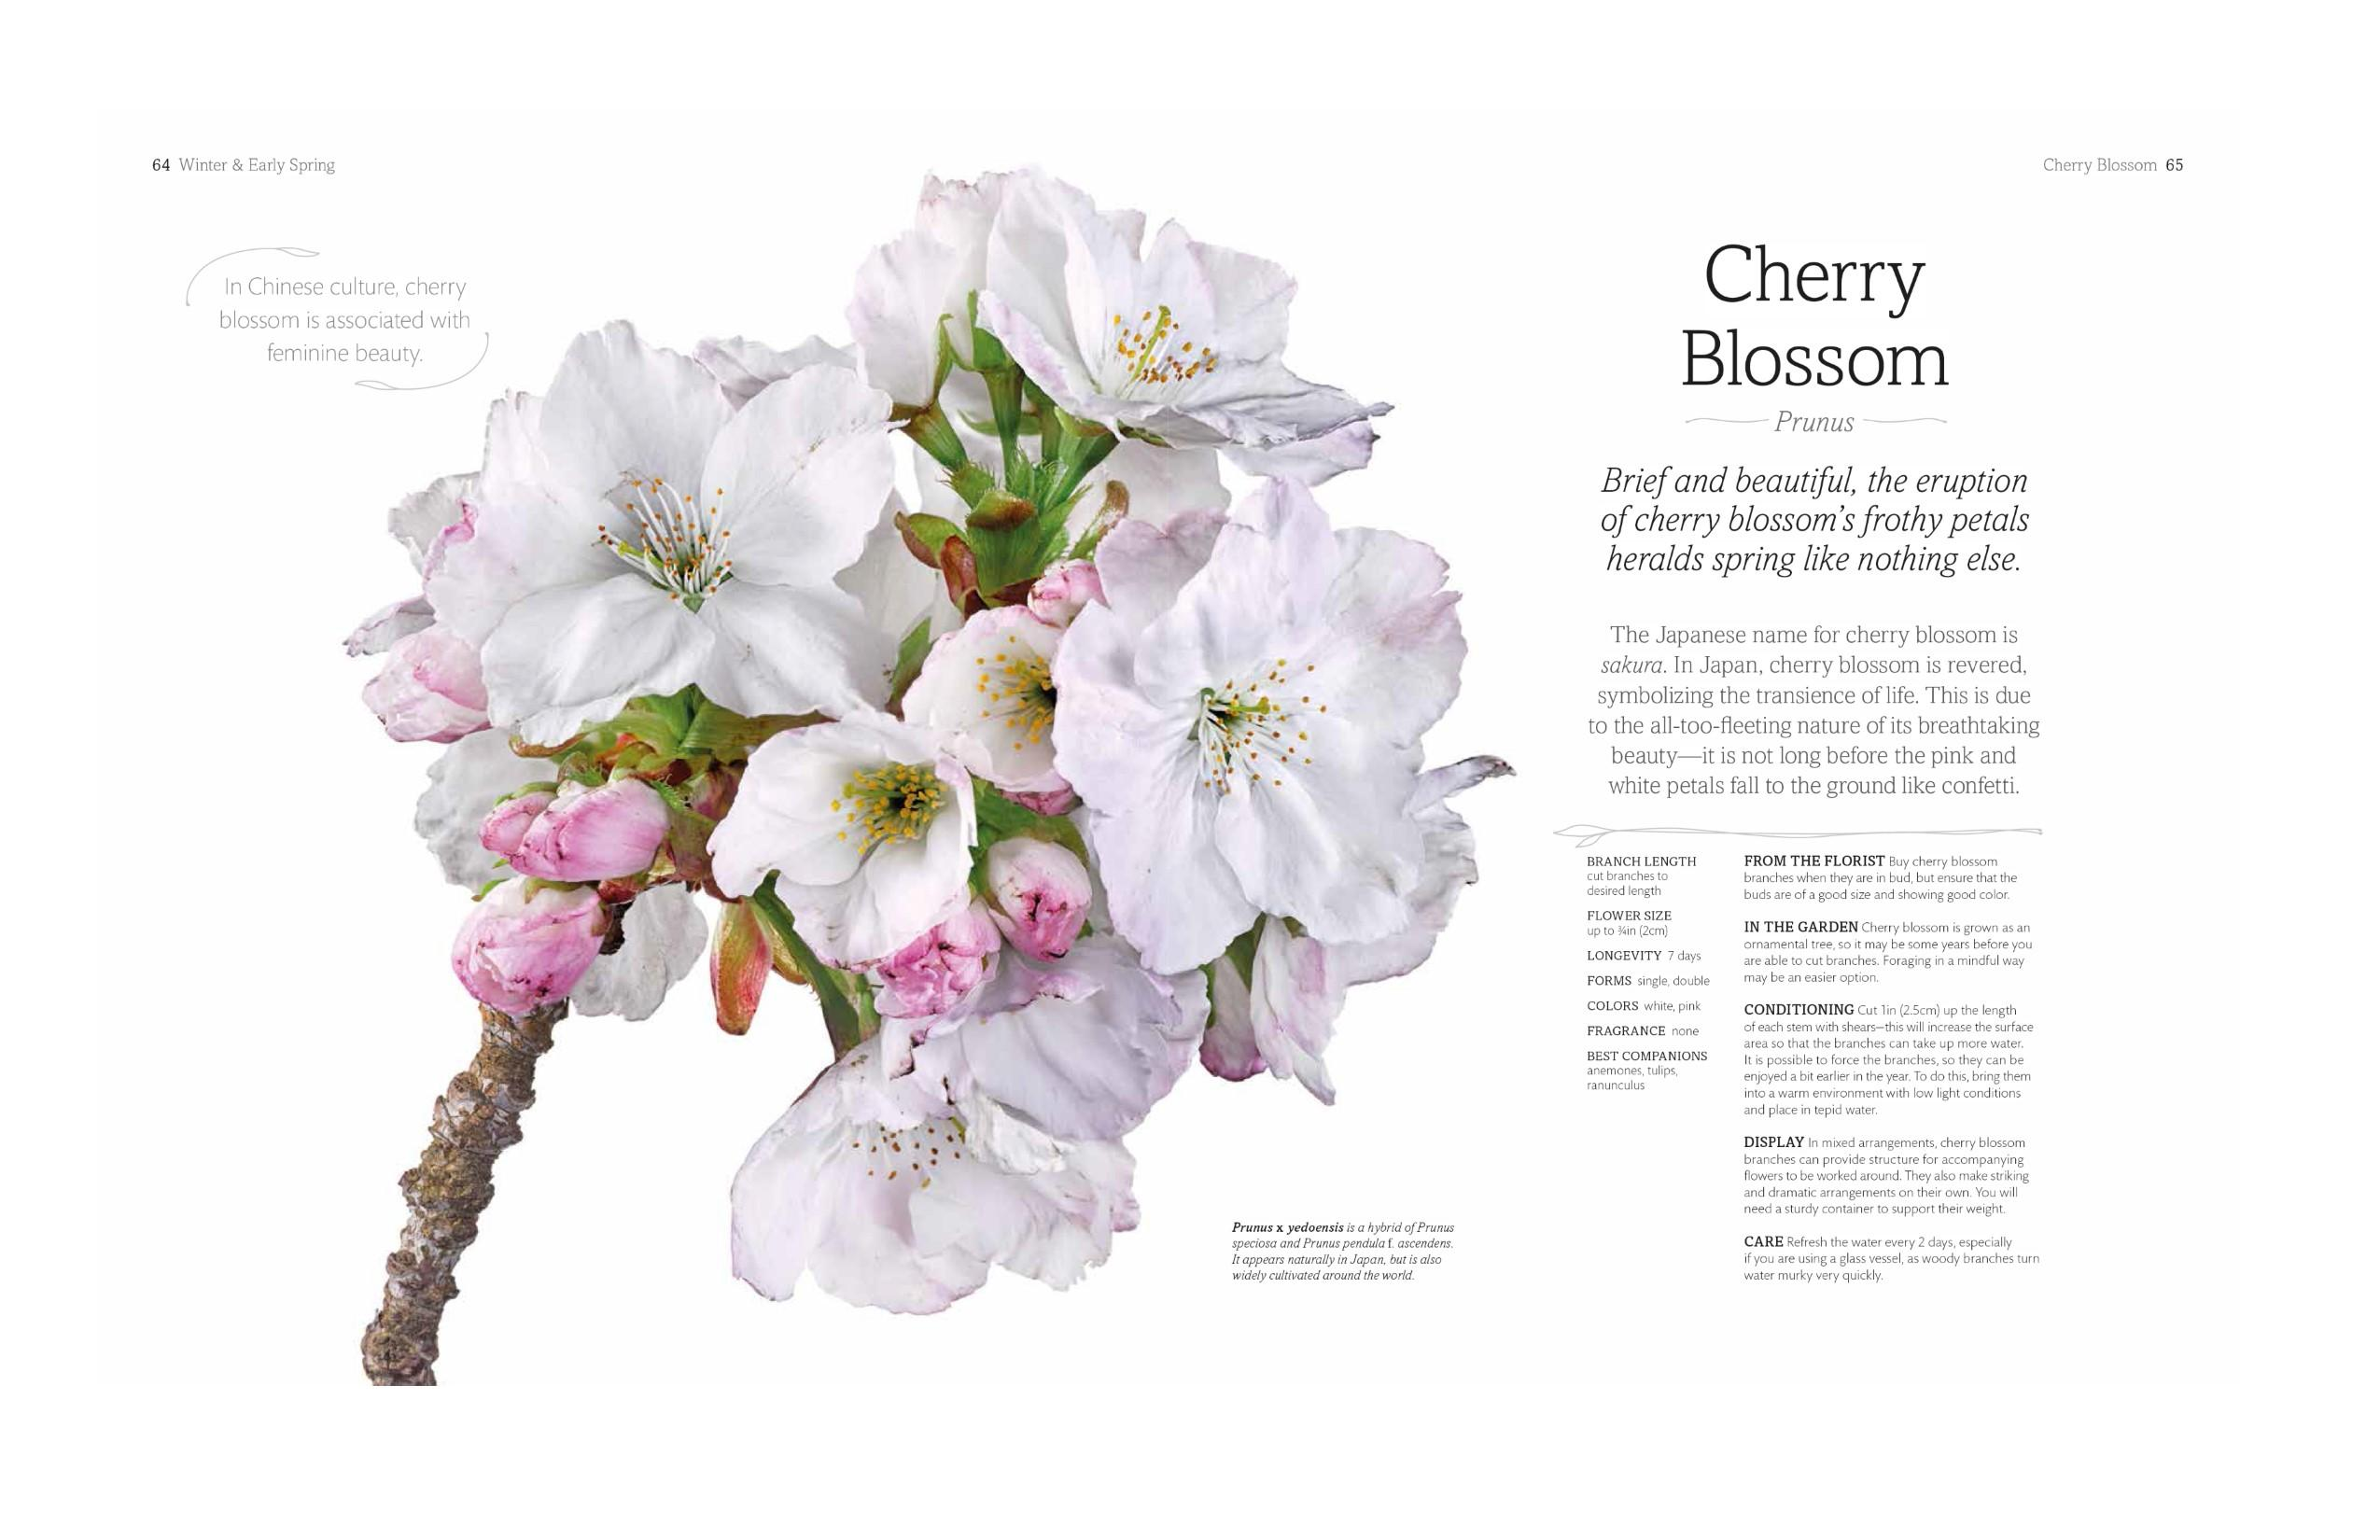 The flower book rachel siegfried 9781465445483 amazon books view larger izmirmasajfo